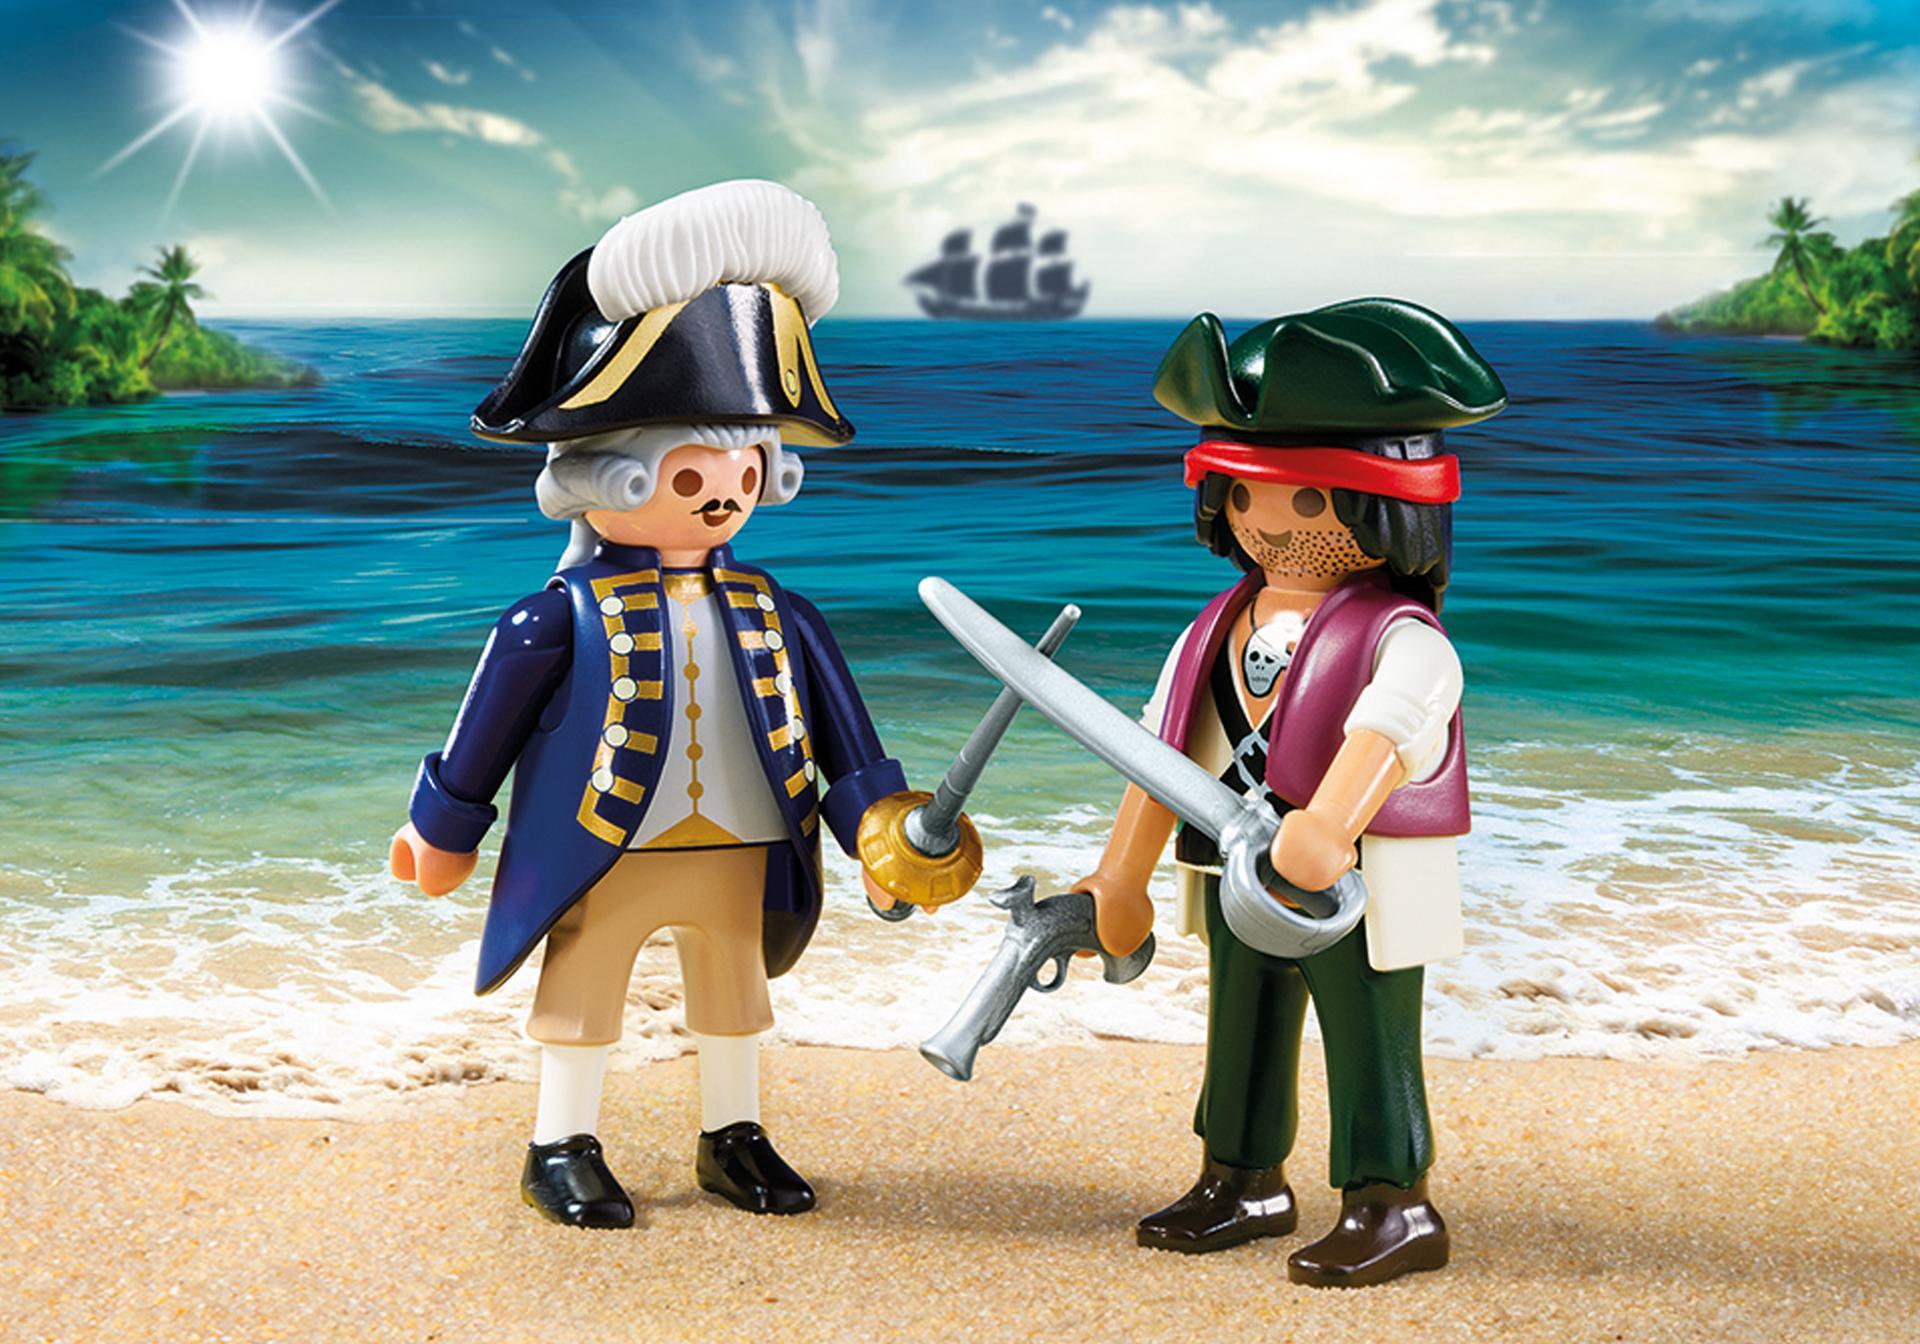 Pirate et soldat royal 6846 playmobil france - Coloriage playmobil pirate ...